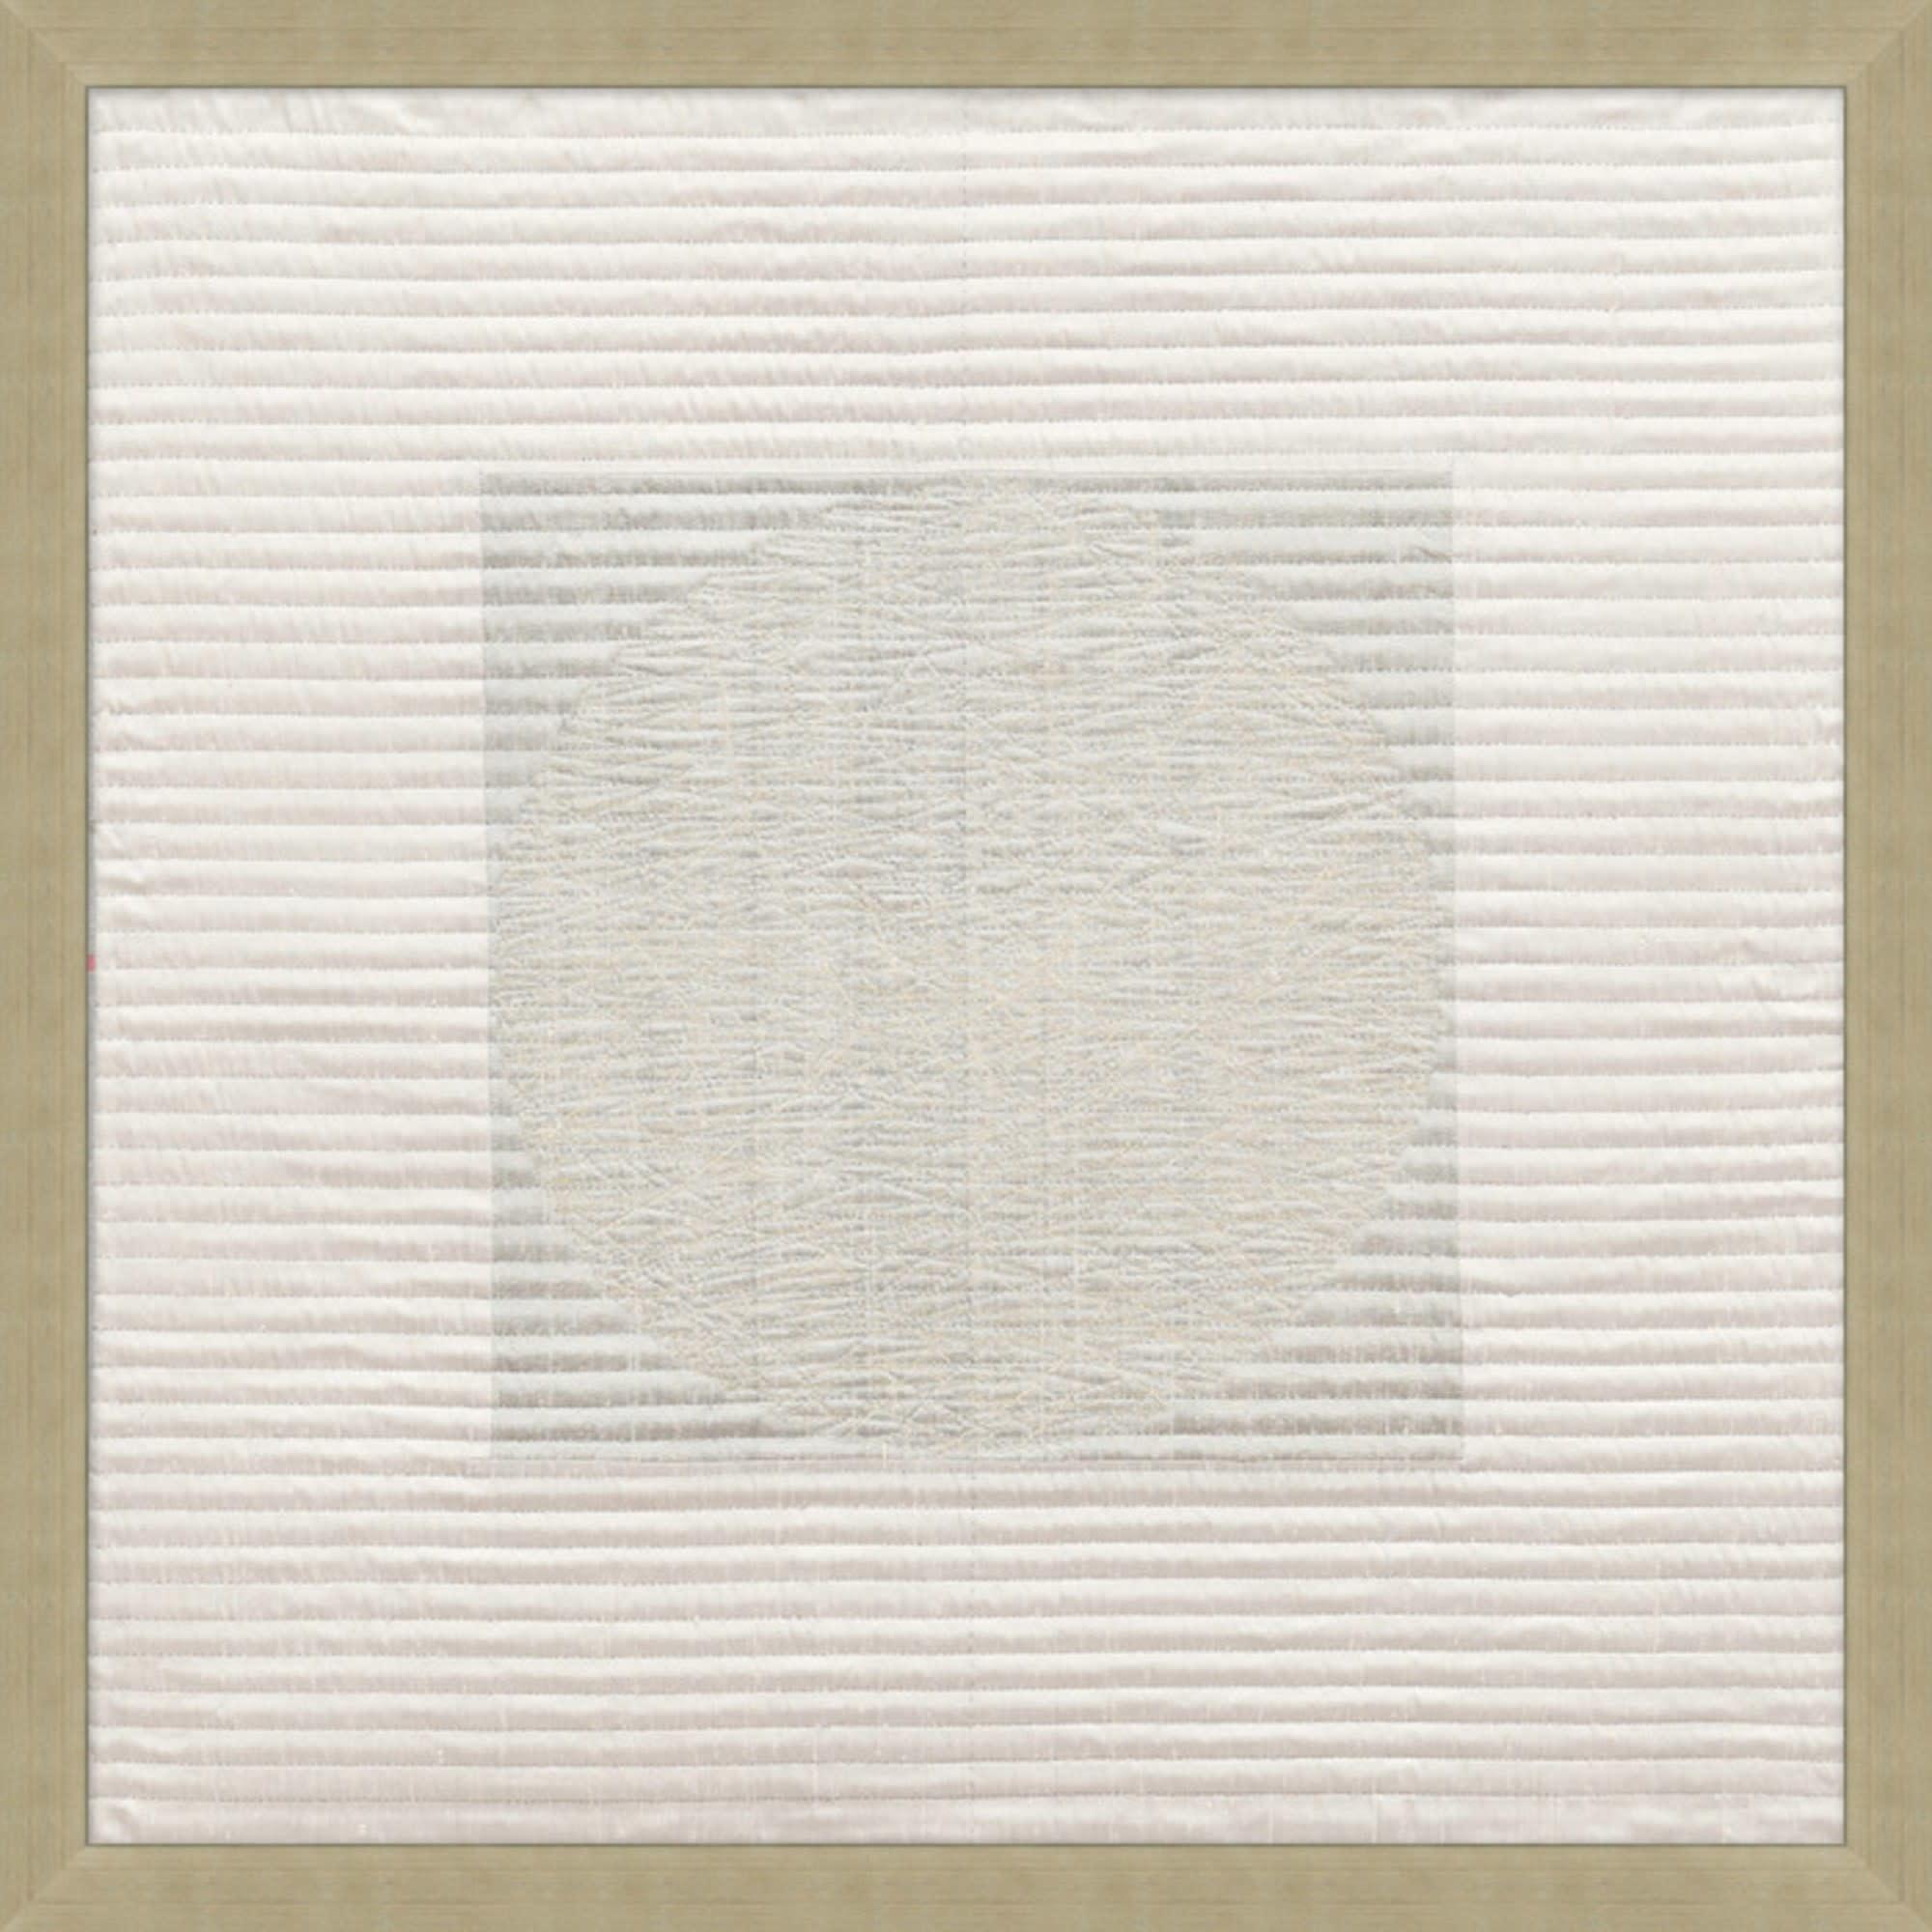 Wendover Art Group Monochromatic Texture 1